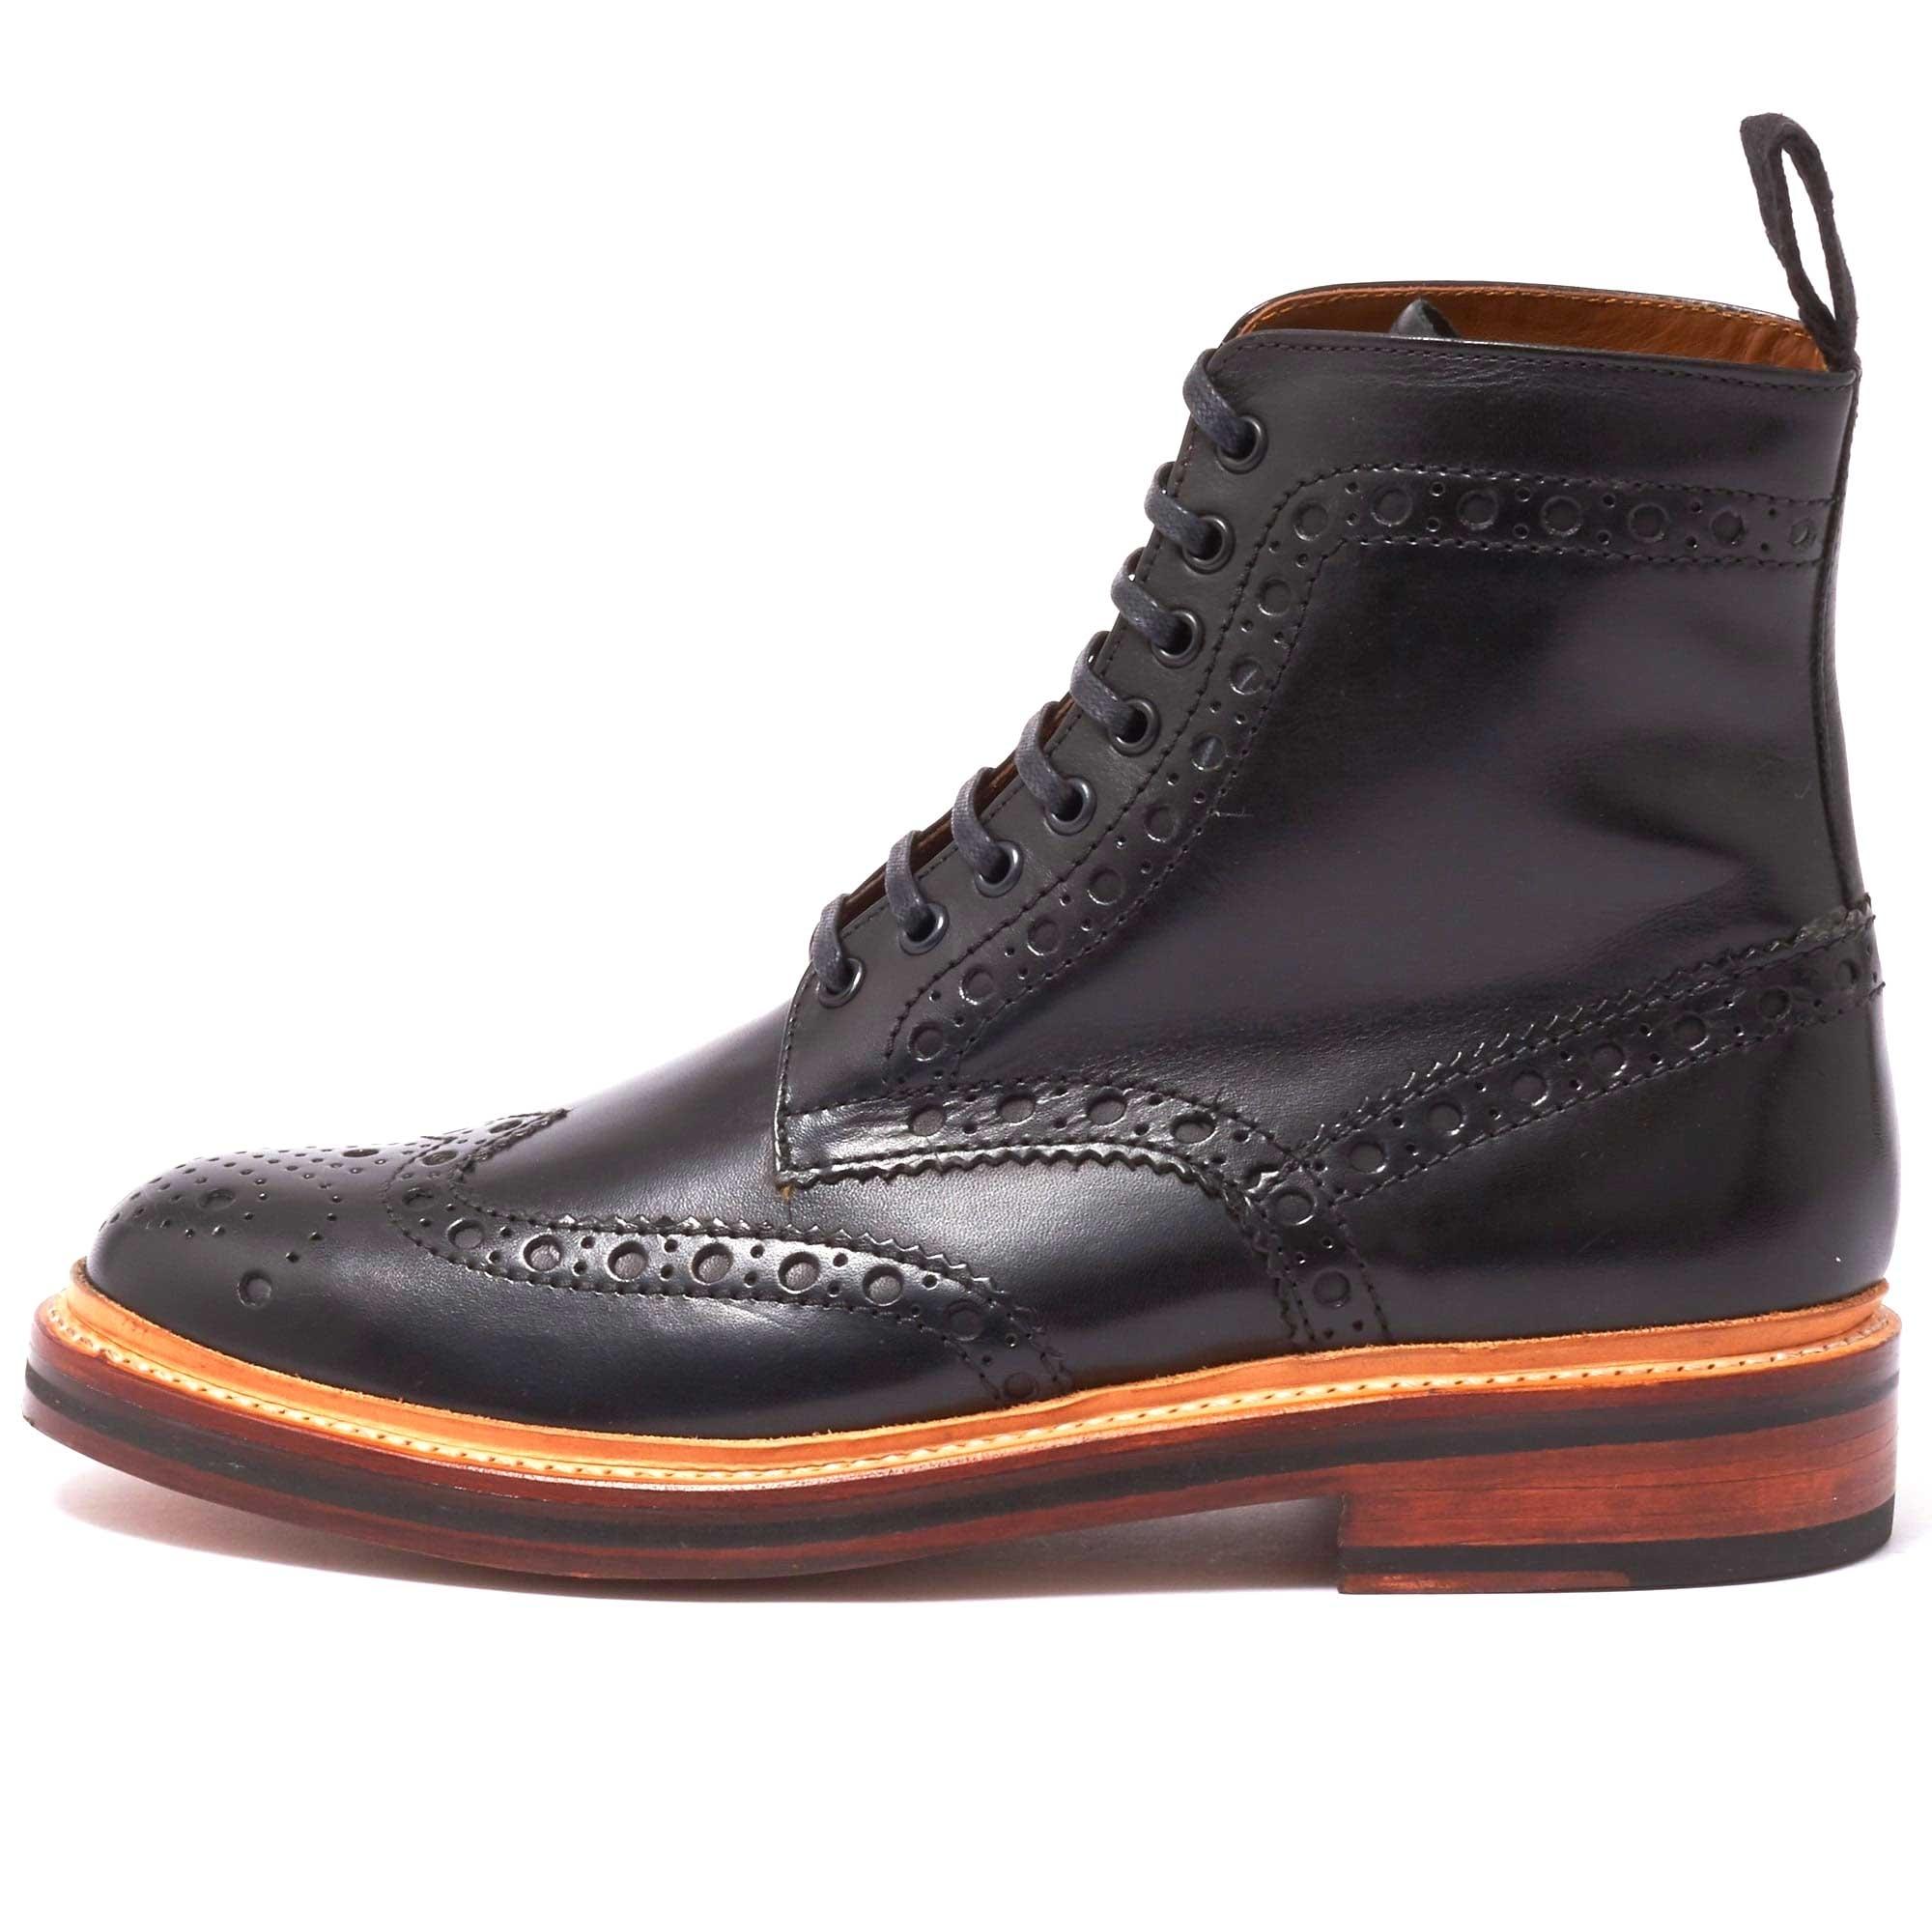 grenson black boots